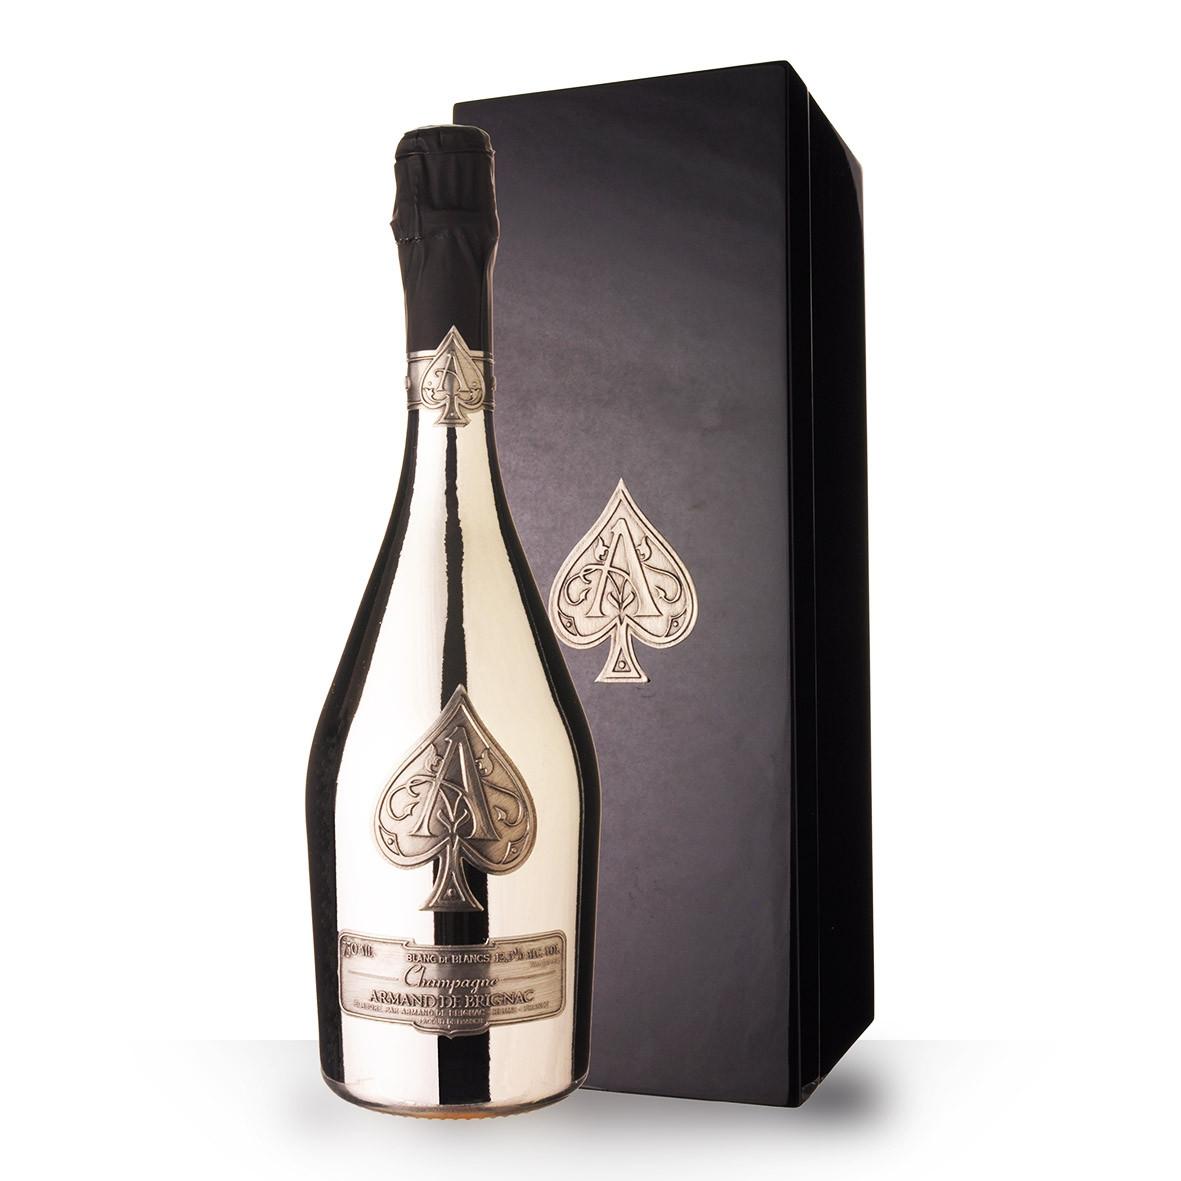 Champagne Armand de Brignac Blanc de Blancs 75cl Coffret www.odyssee-vins.com